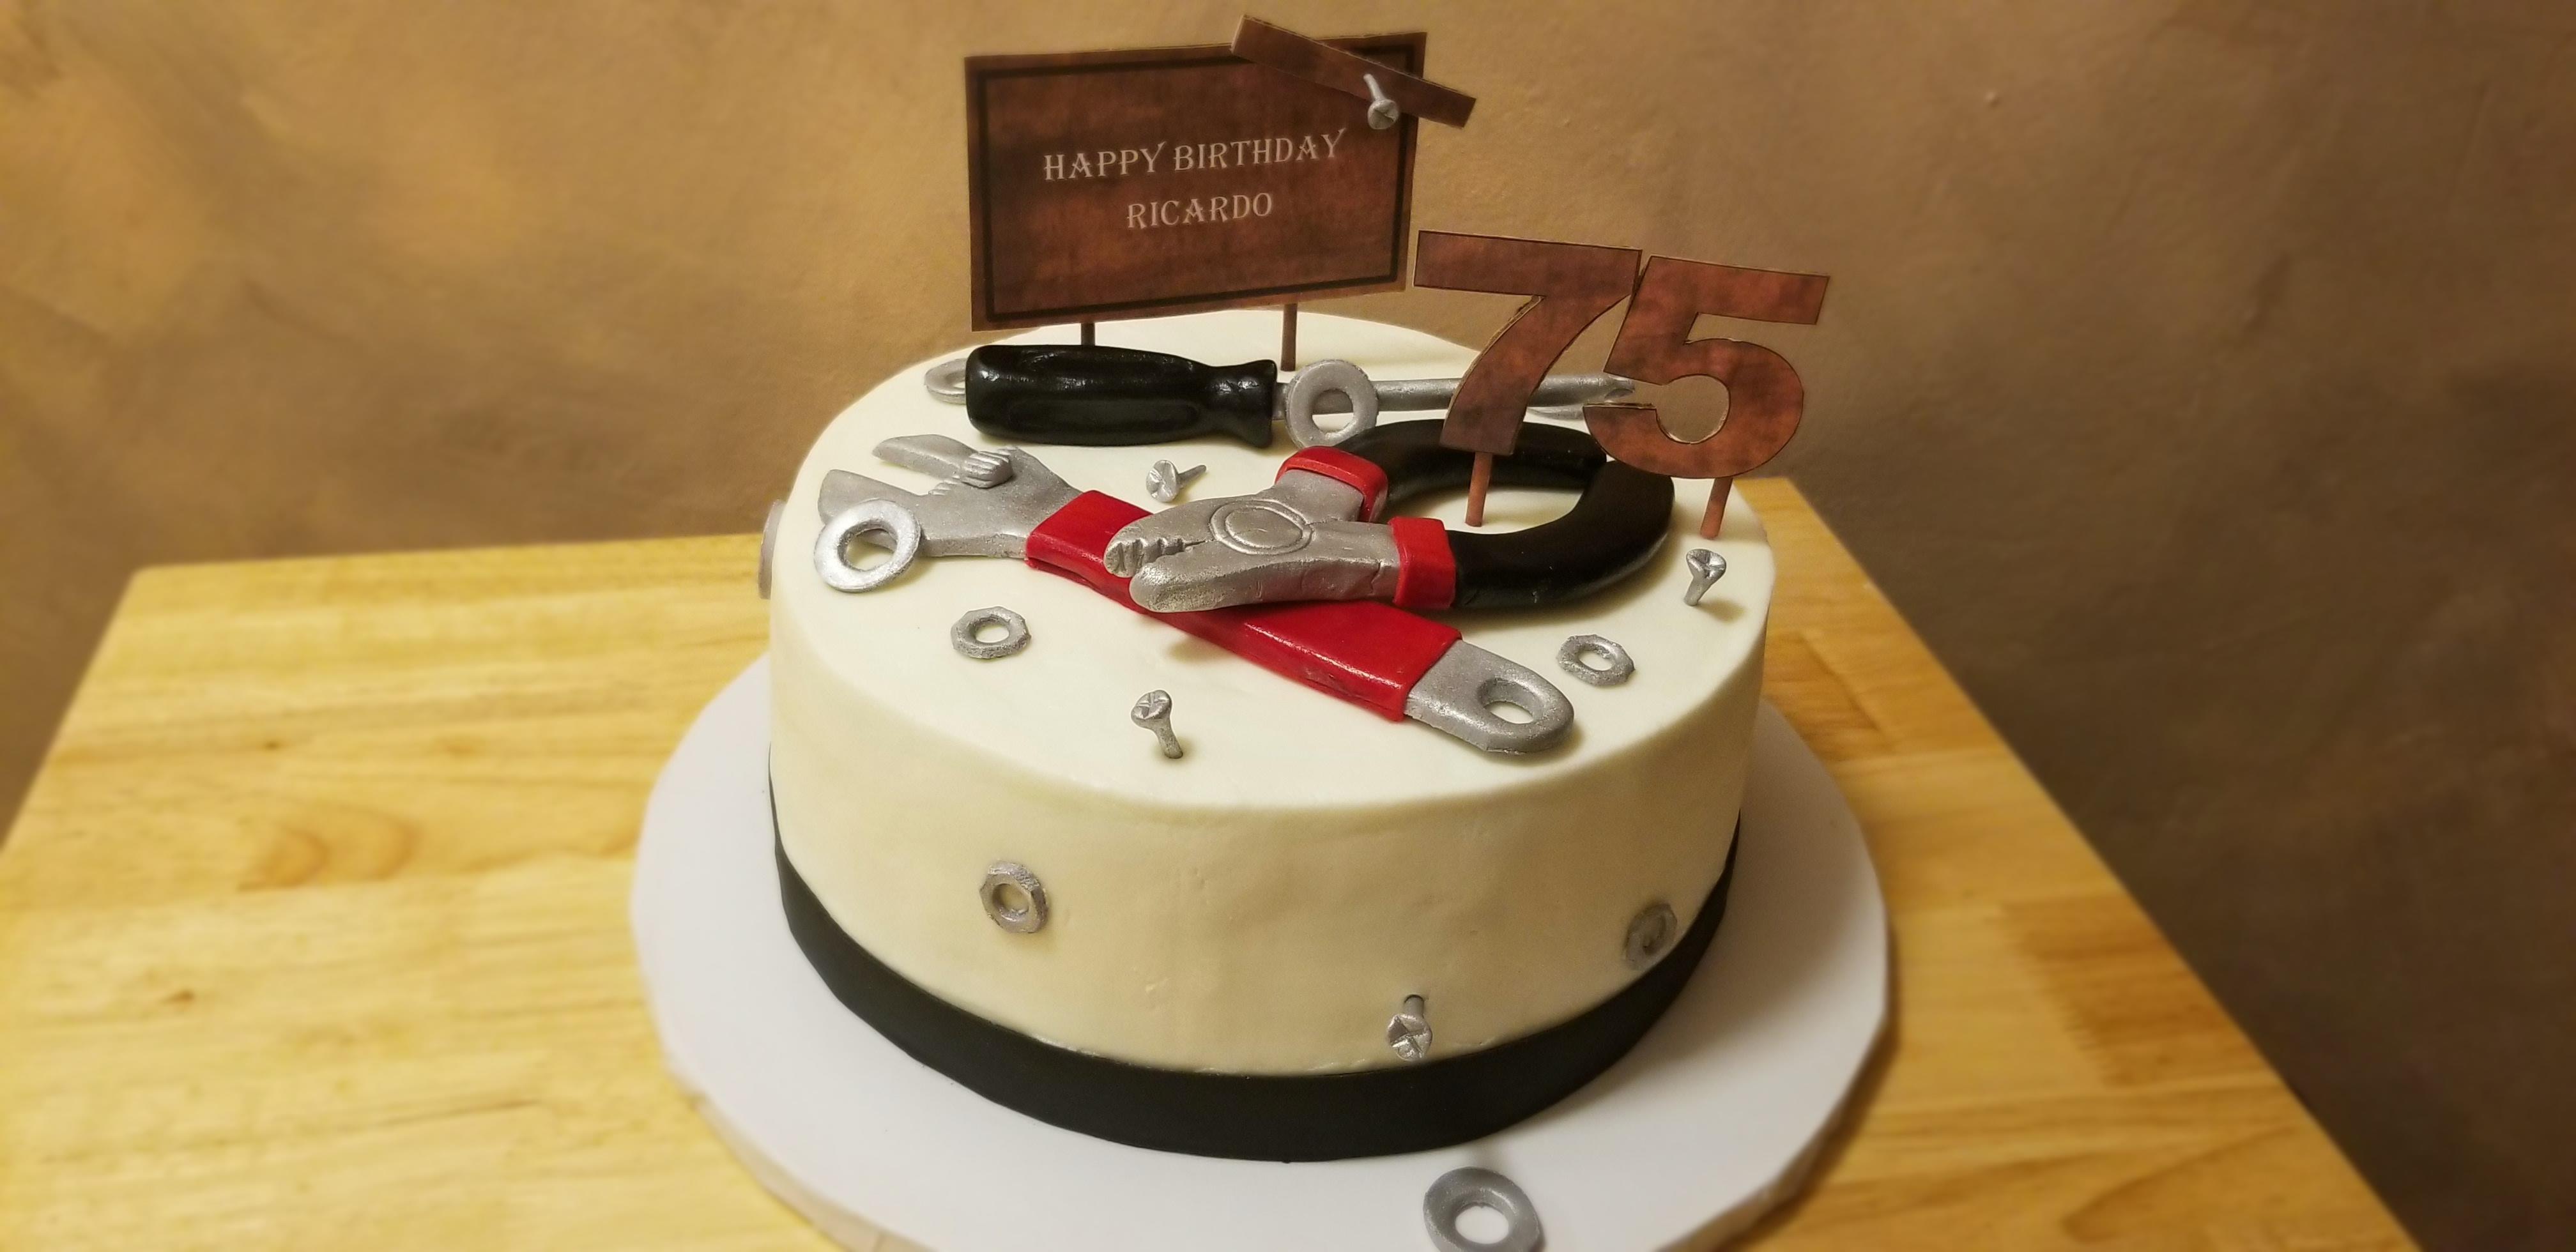 Handyman tools cake